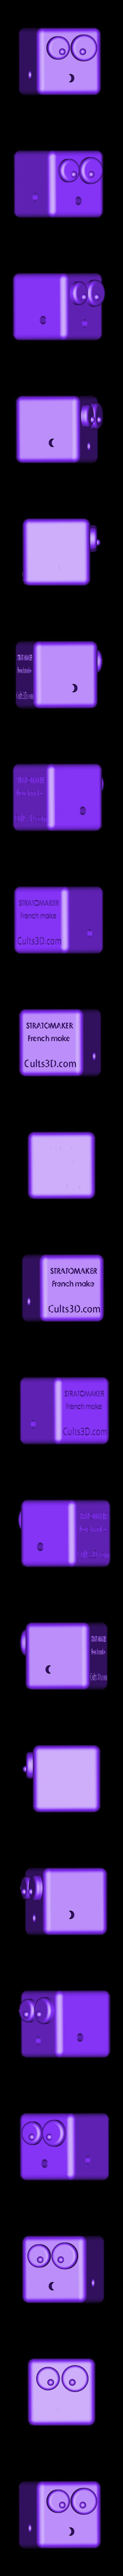 têteV5.2.STL Download free STL file Mr Patato STRATOMAKER • 3D printing object, boyery